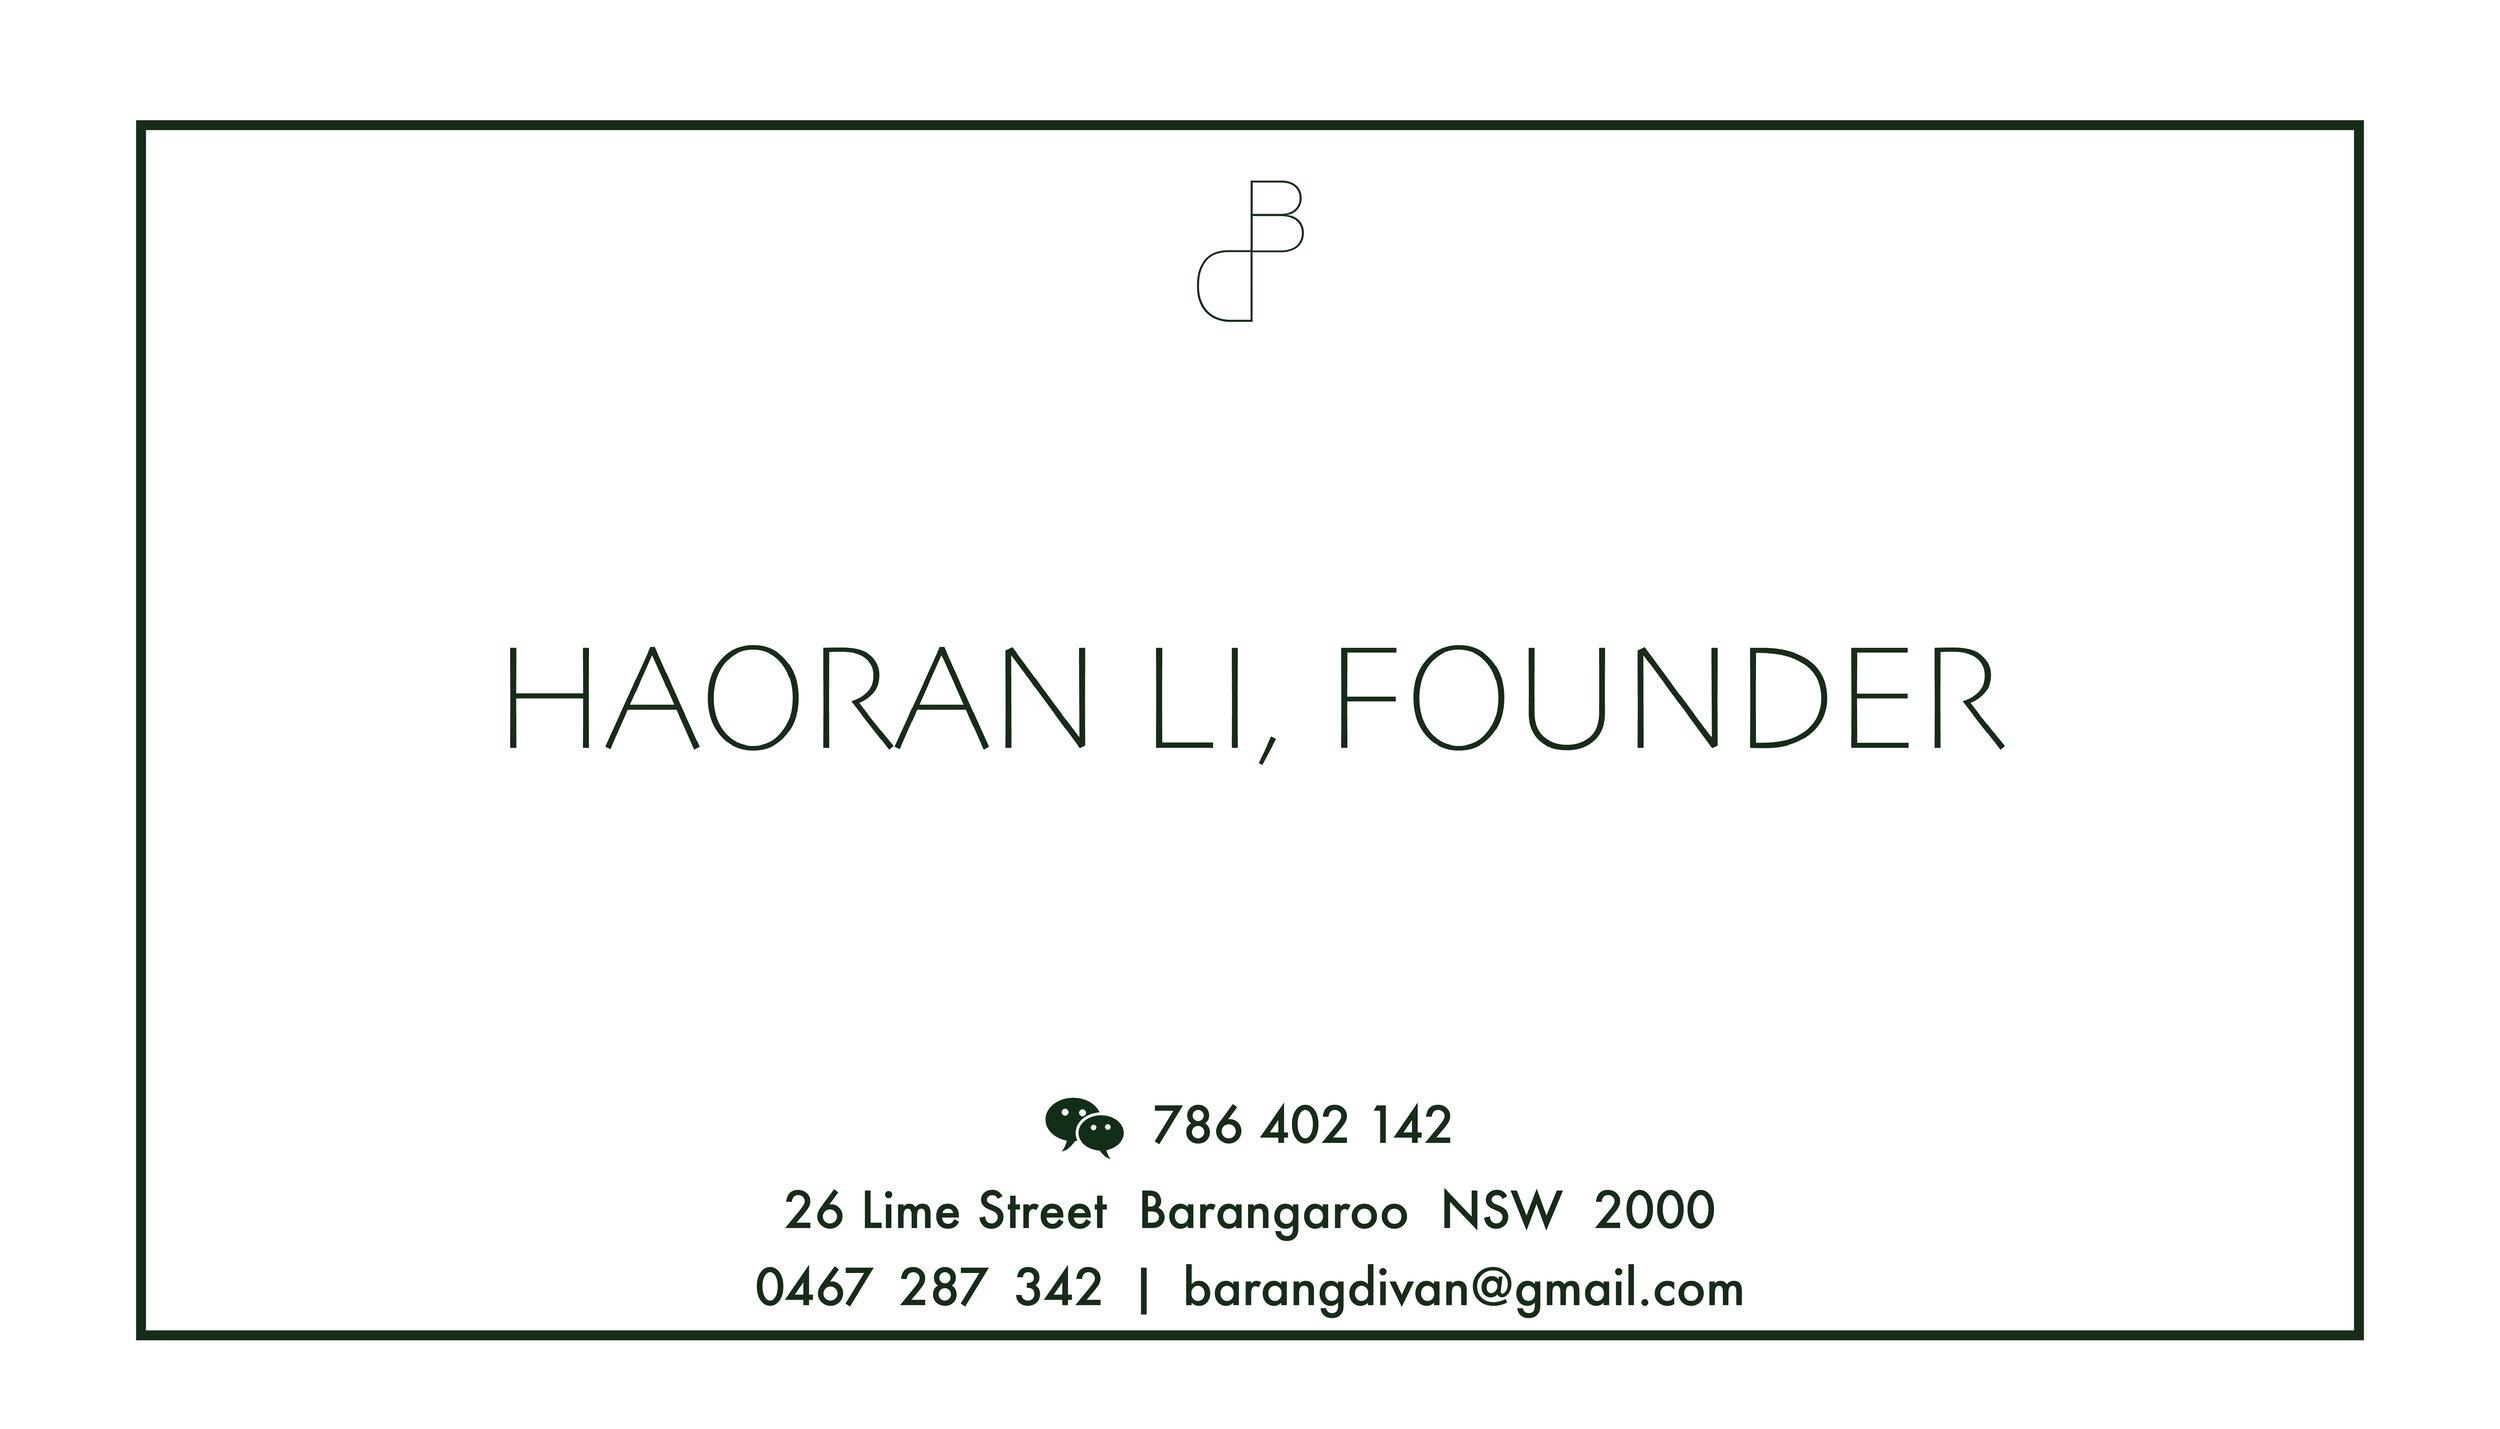 Barang Divan Business Cards2.jpg